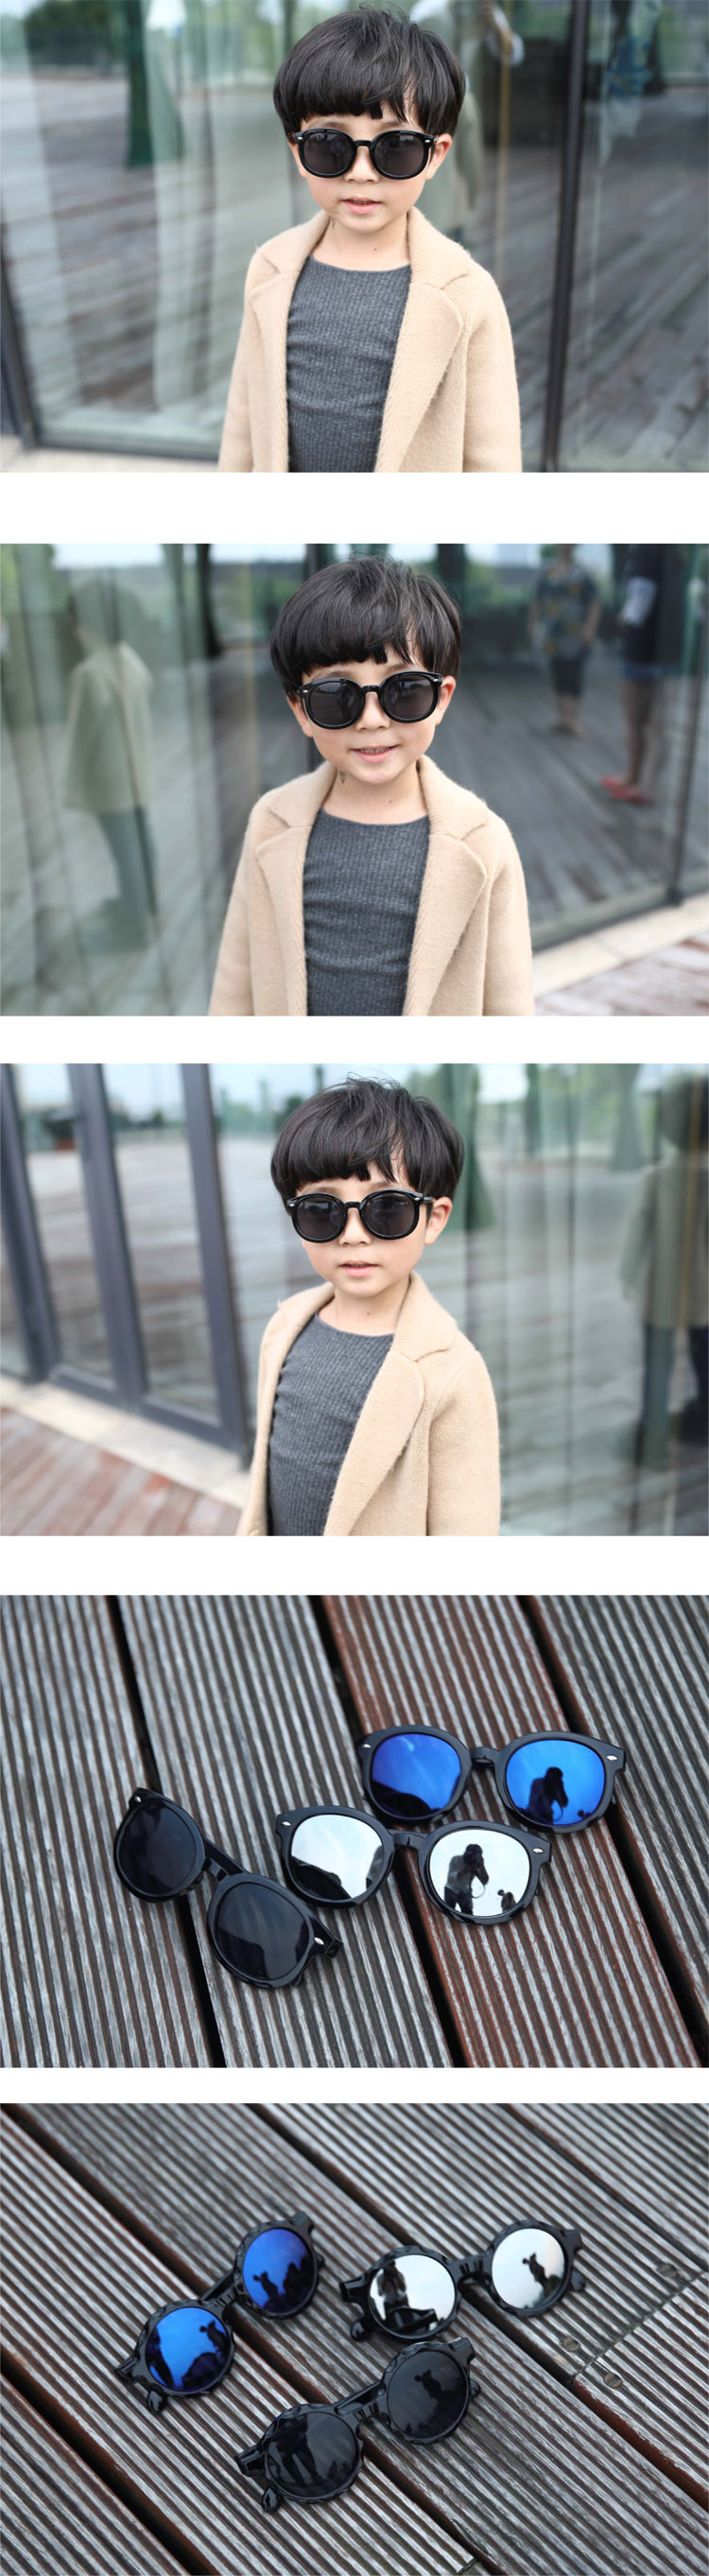 5d1b191f4a7 student Sunglasses South Korean boy reflective Sunglasses female 2 ...